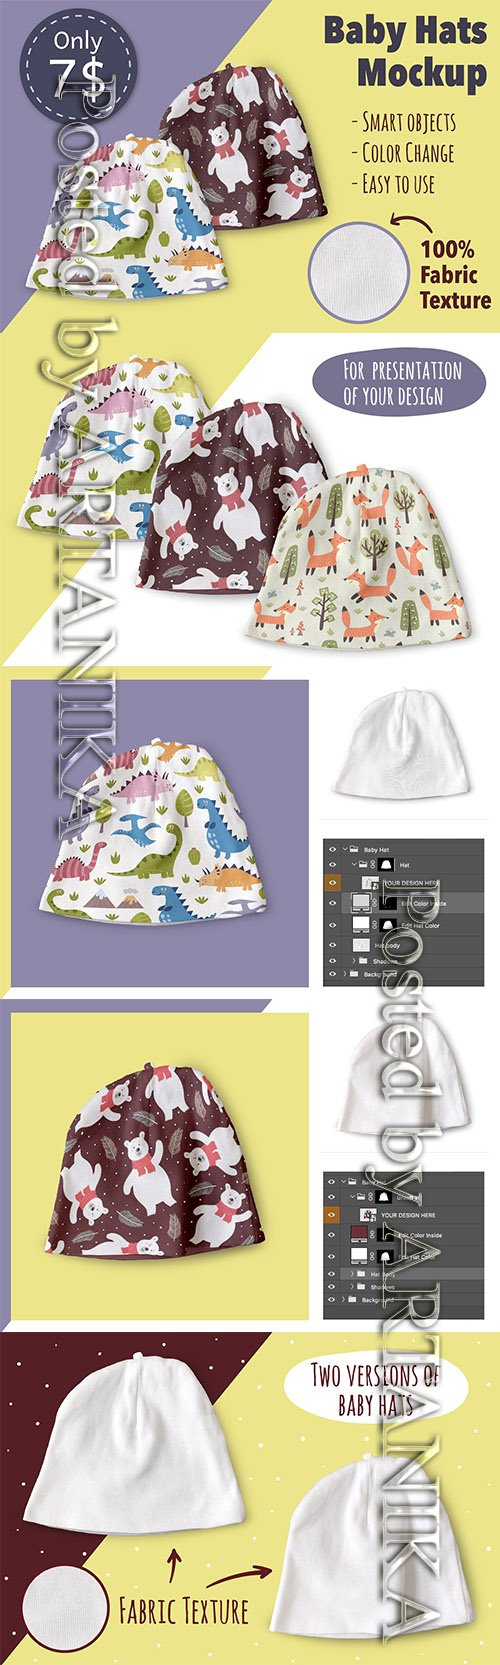 Baby Hats Mockup 3648218